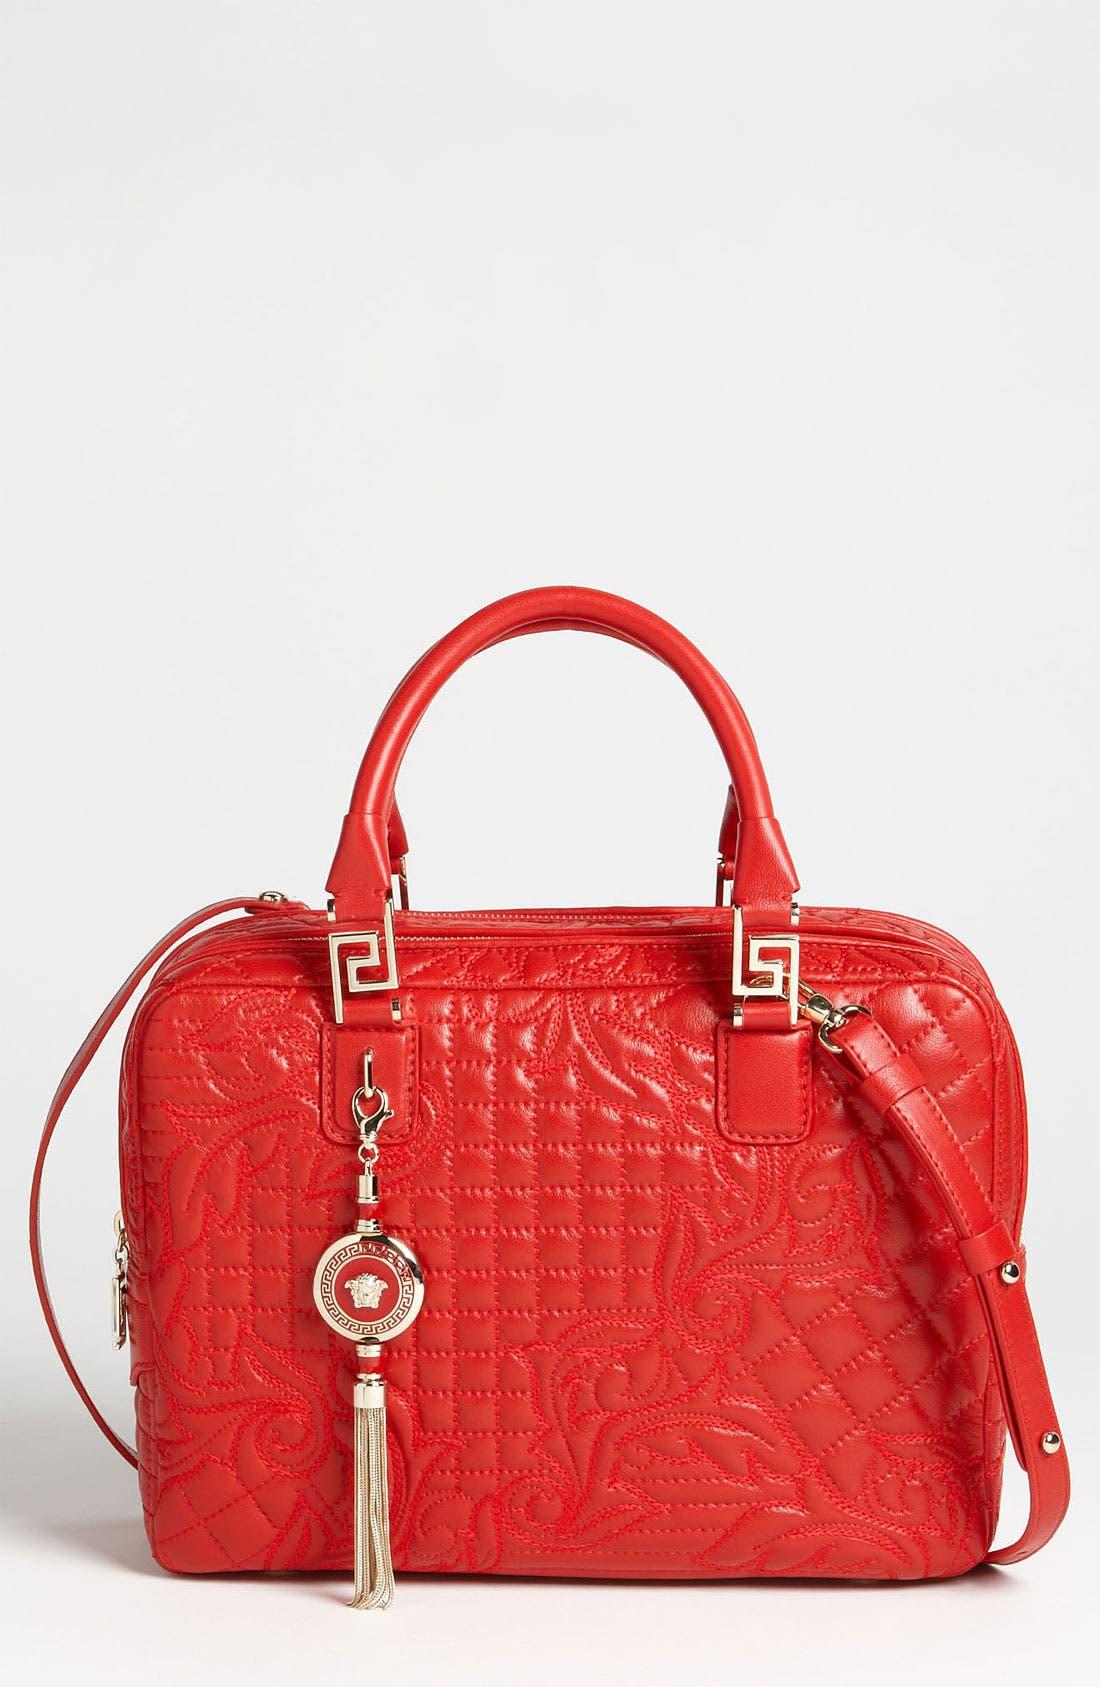 Main Image - Versace 'Linea' Leather Satchel